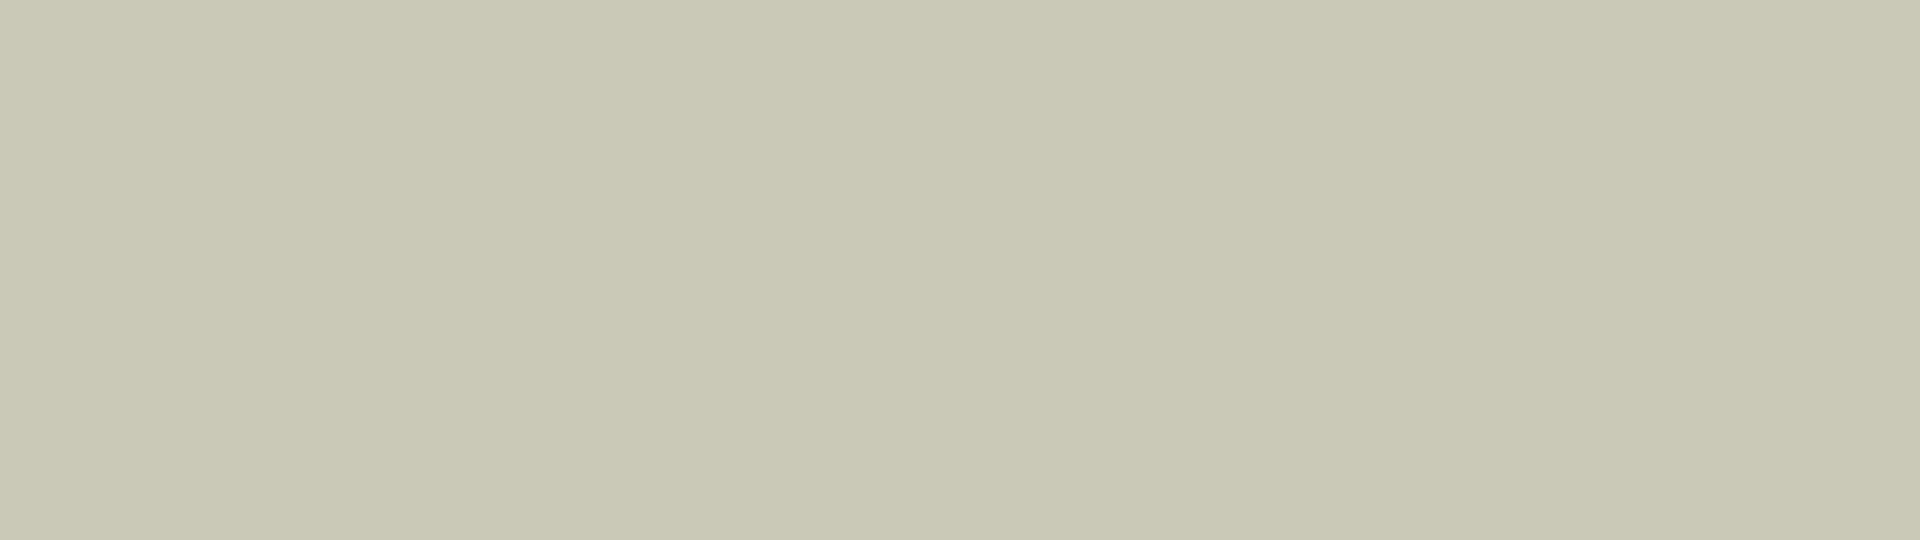 CATEGORY-ANNE-BEBEKBAKIMCANTALARI-19-01